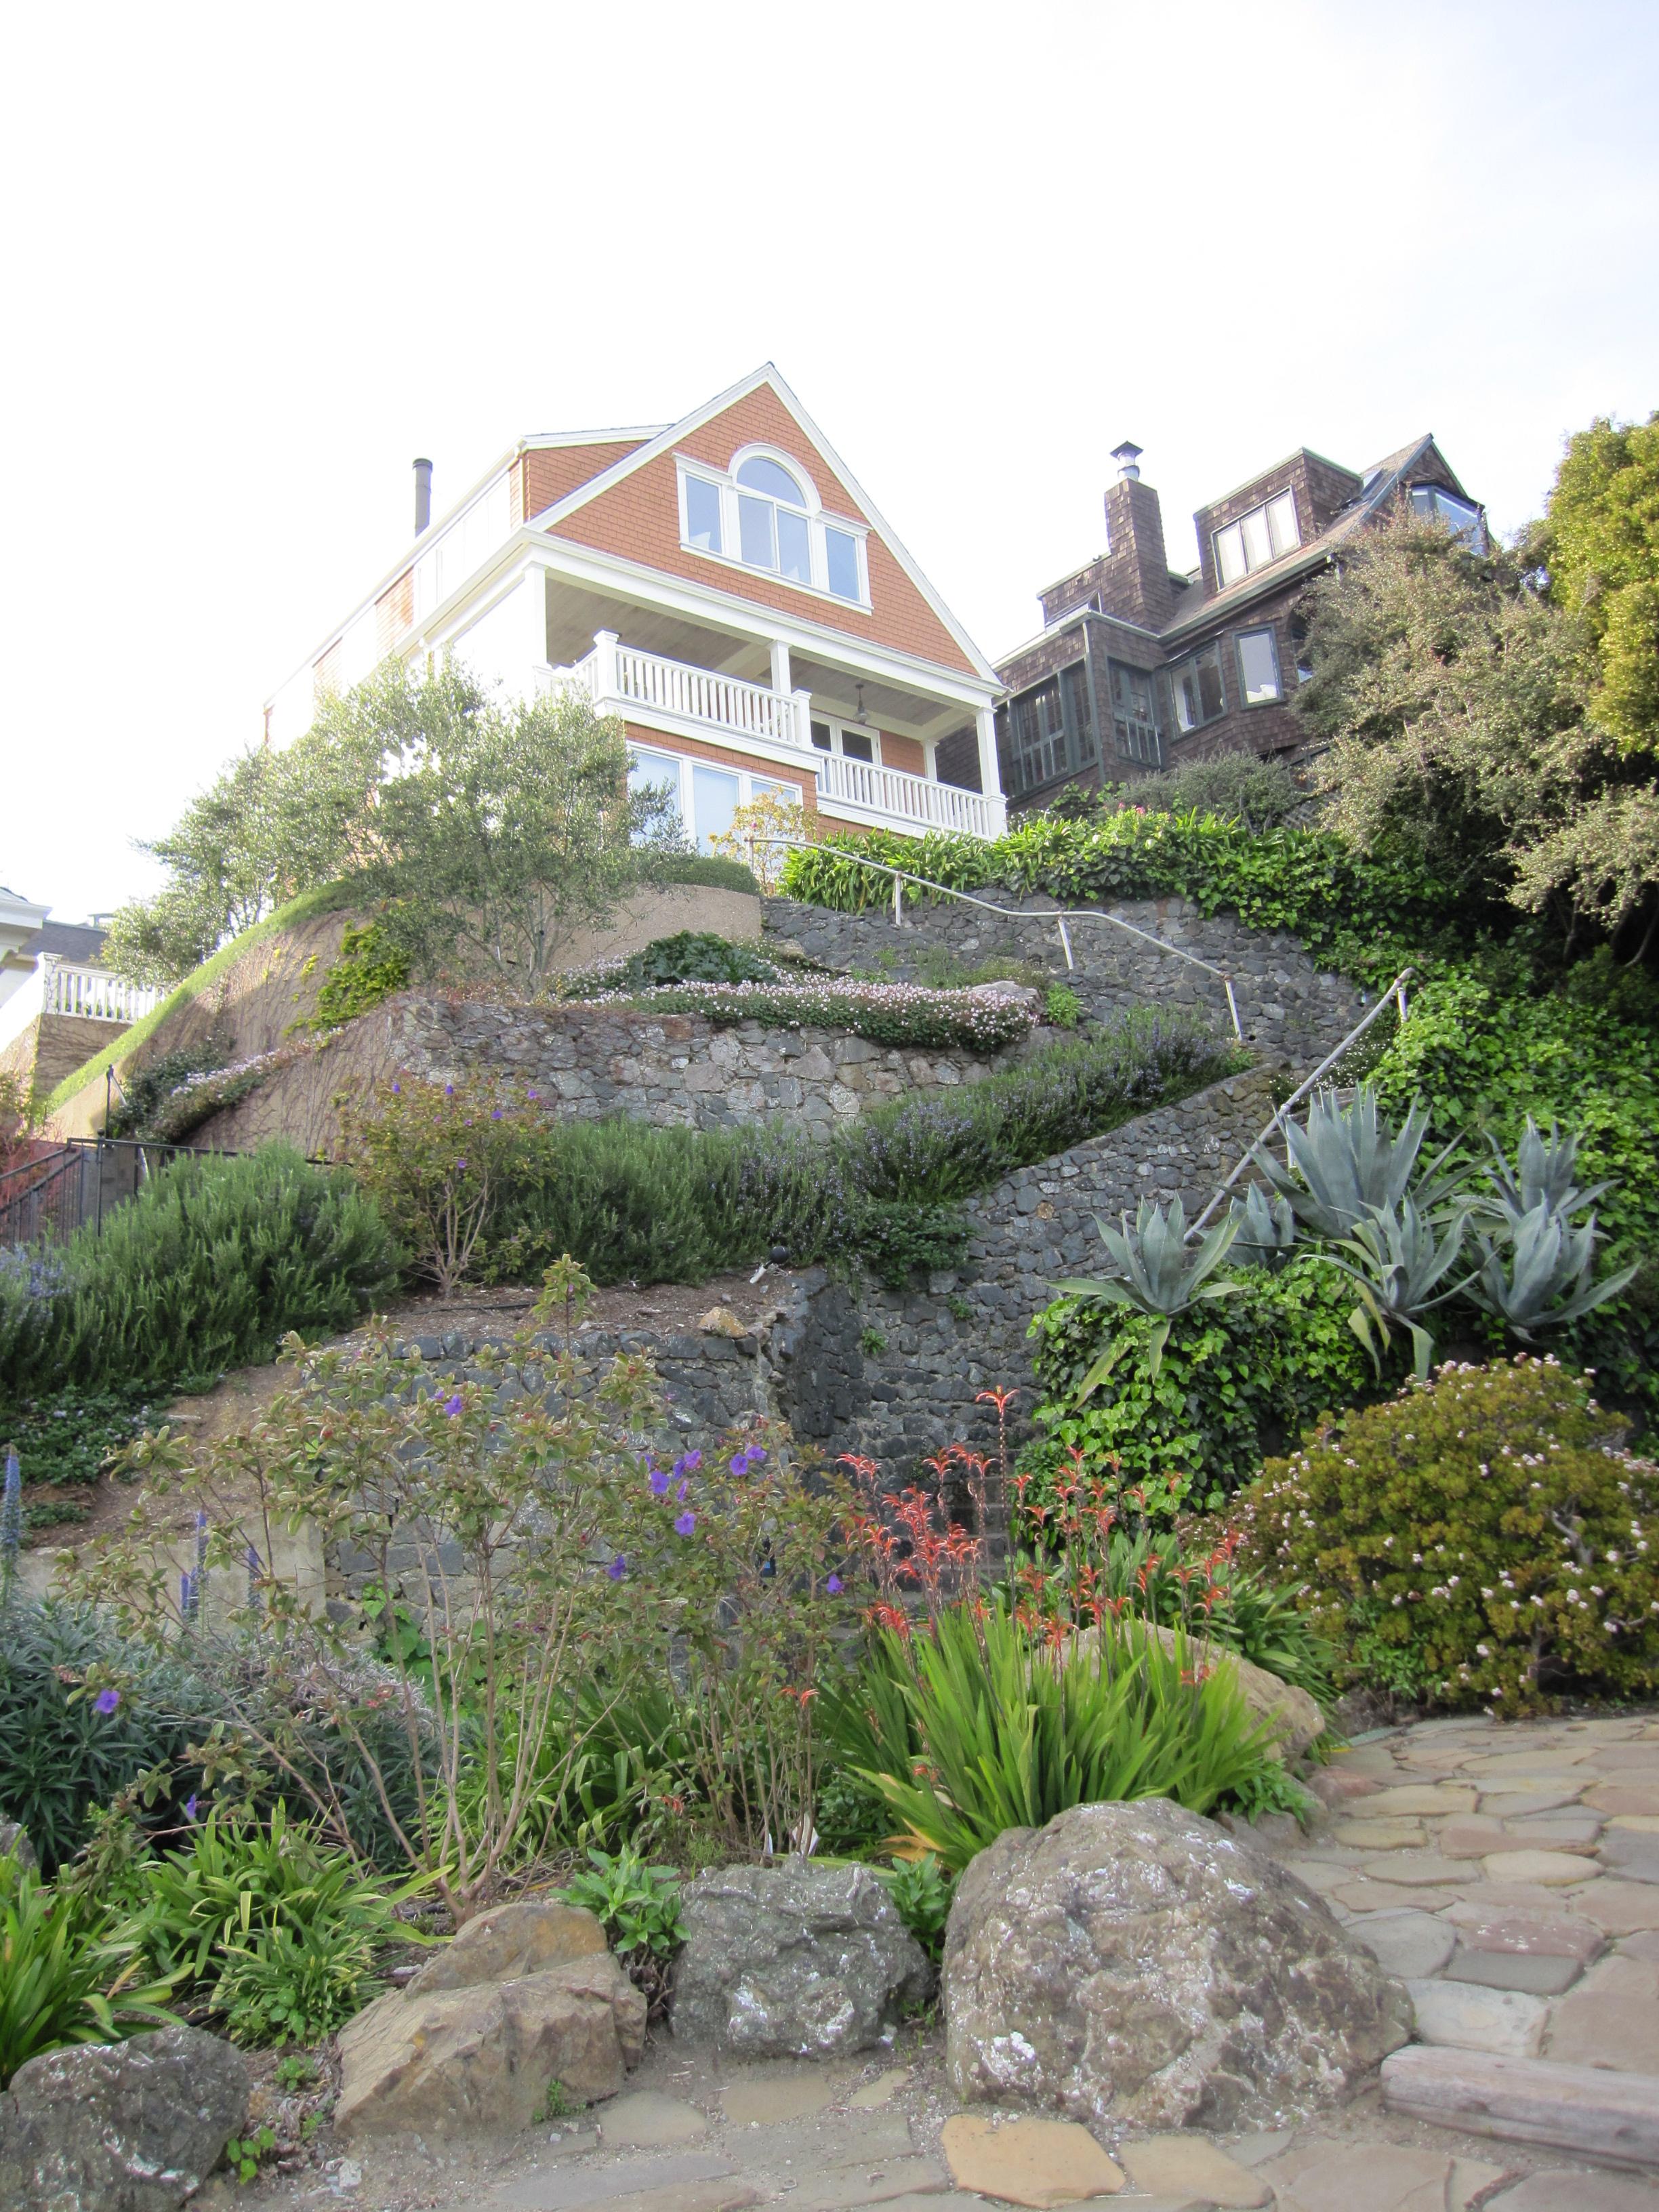 Sausalito Home by Kelley Eling, Marin County Realtor